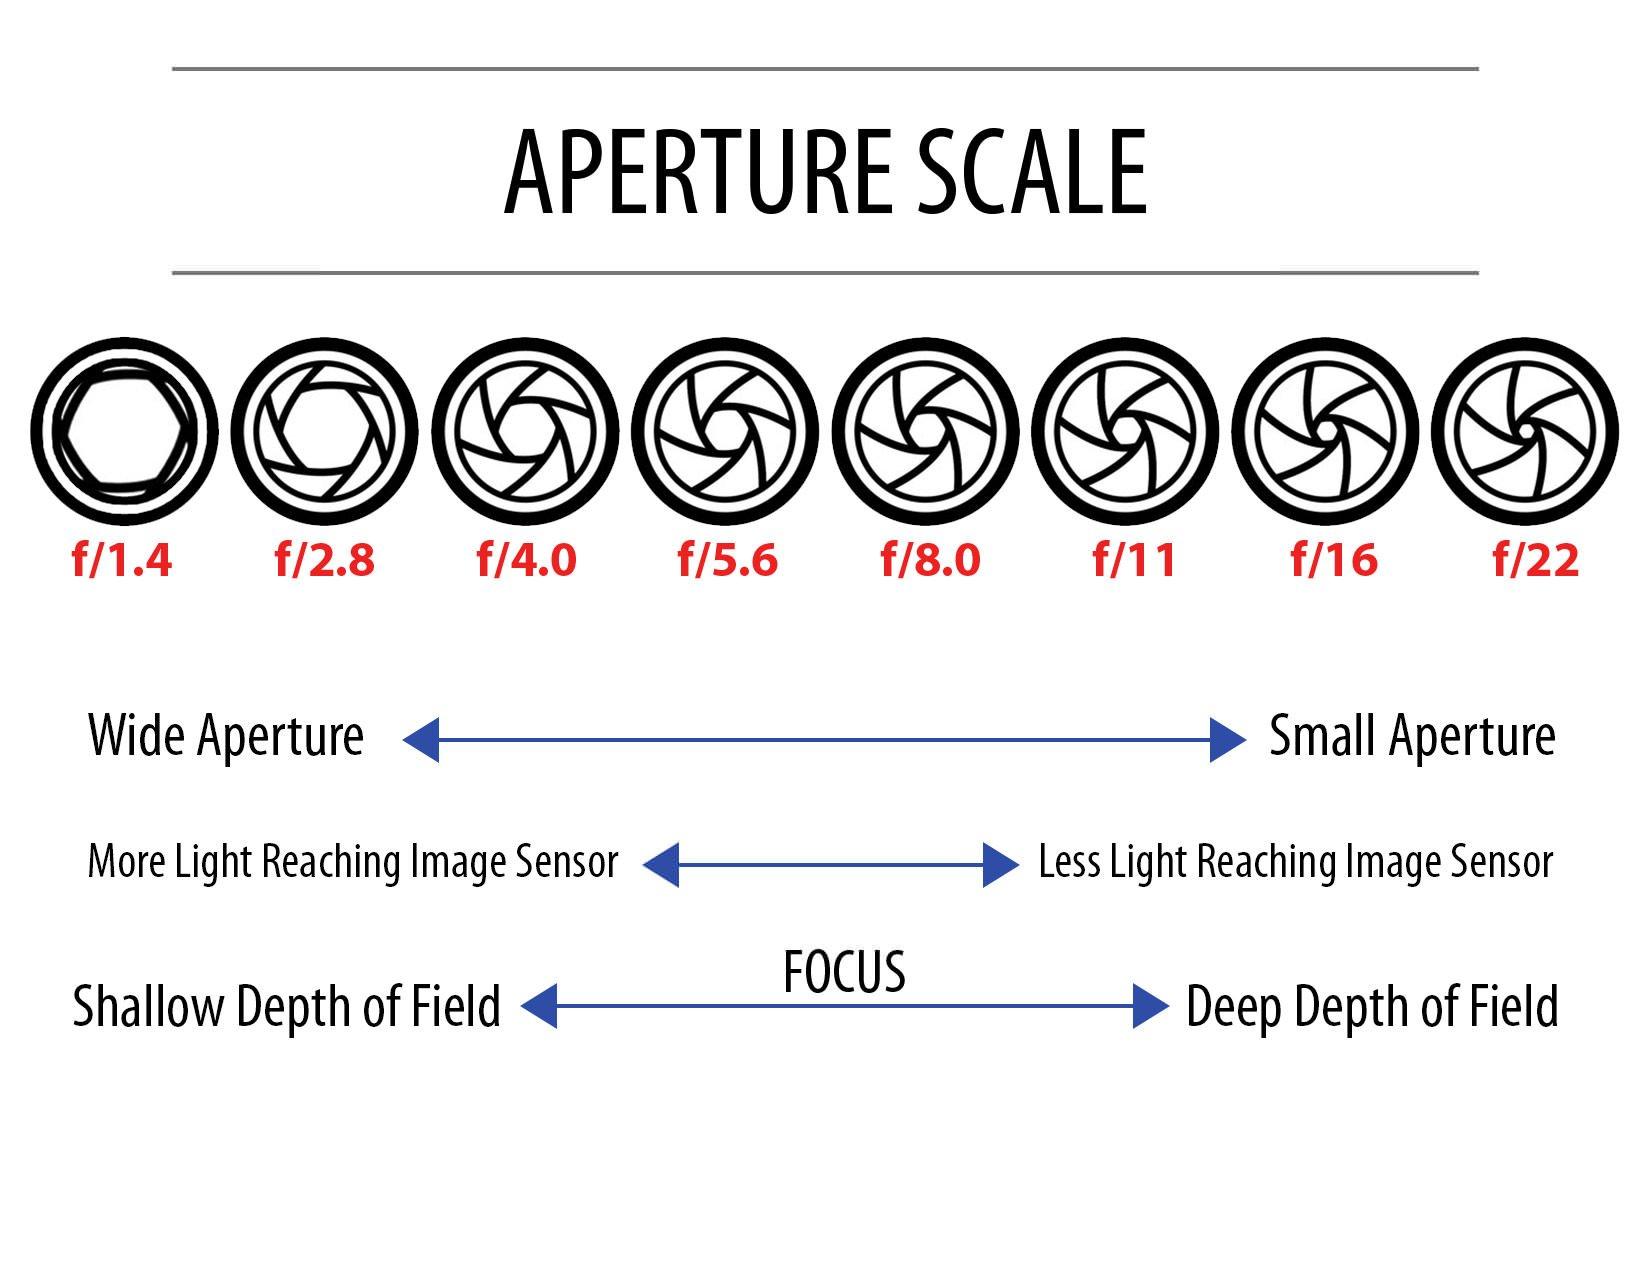 aperturescale2 fdhsjgkh image